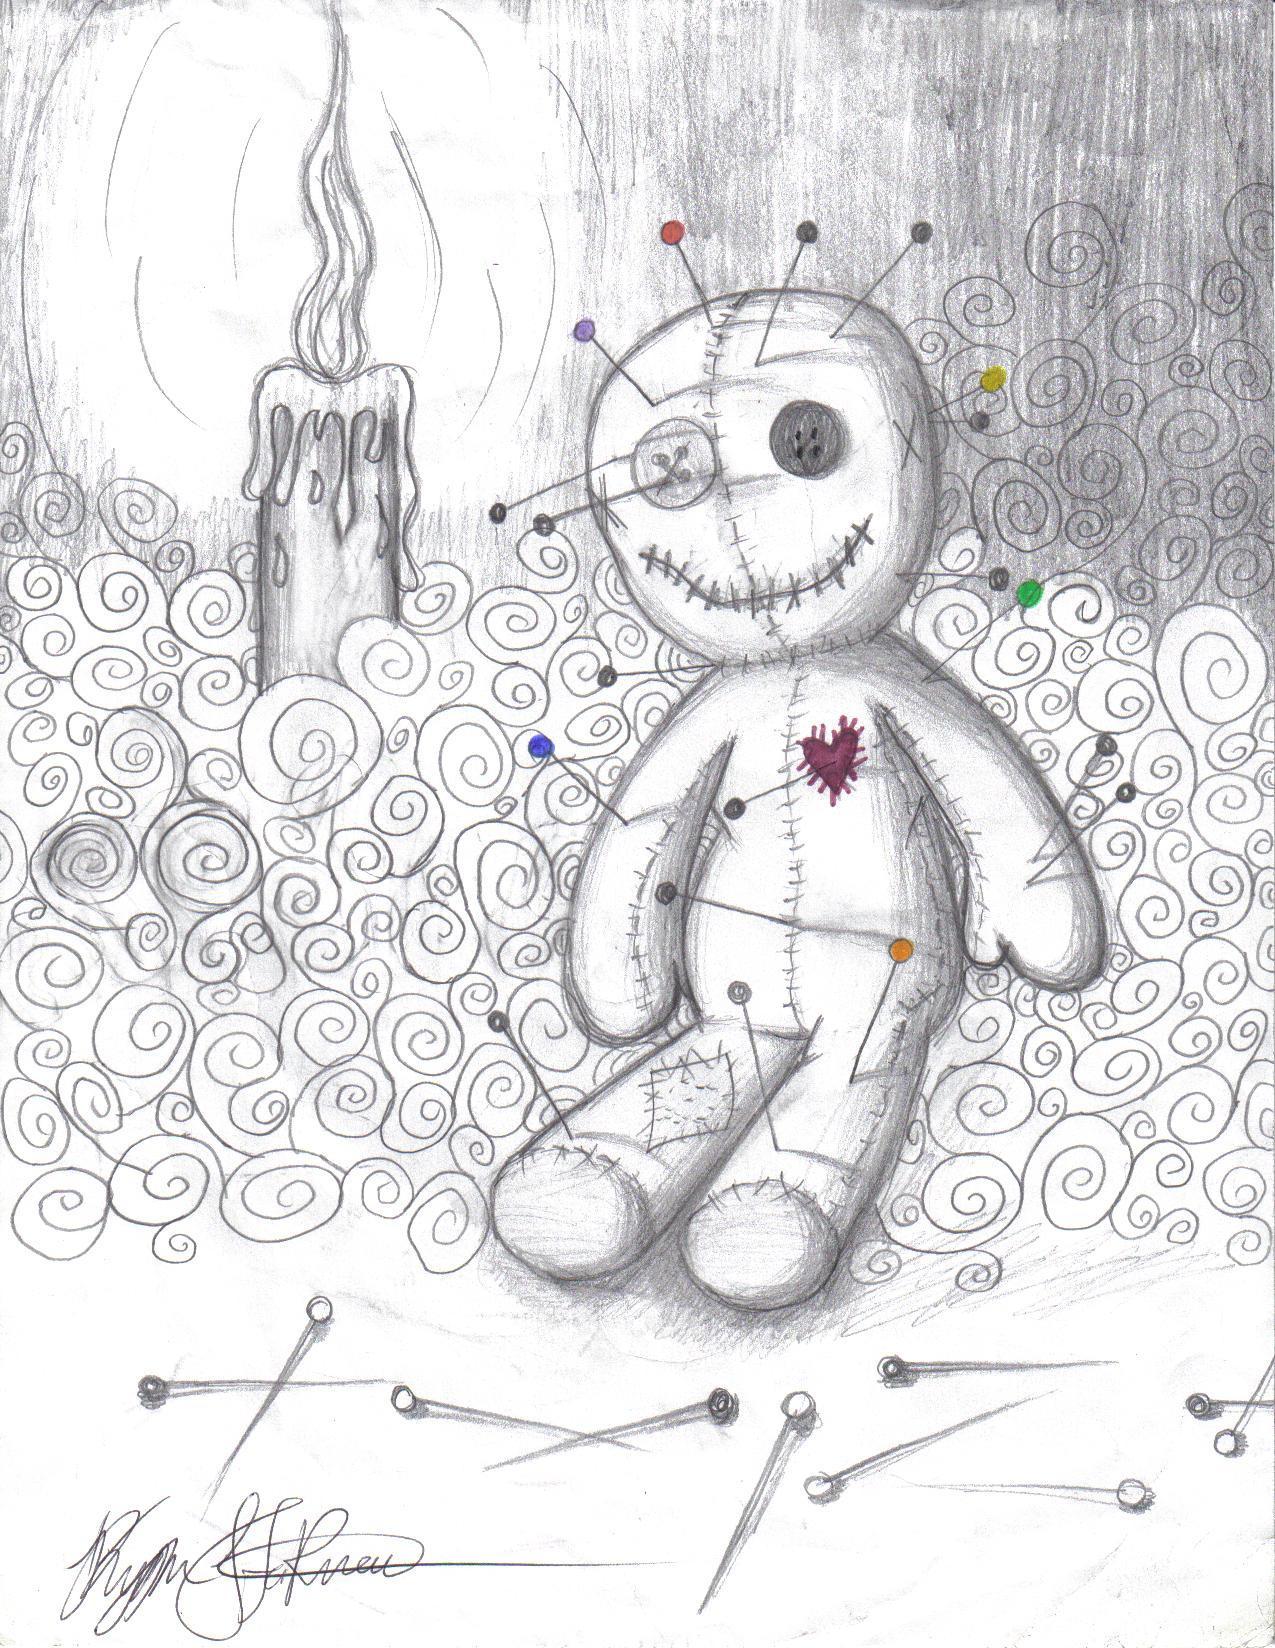 Voodoo doll by Evil-Peanut